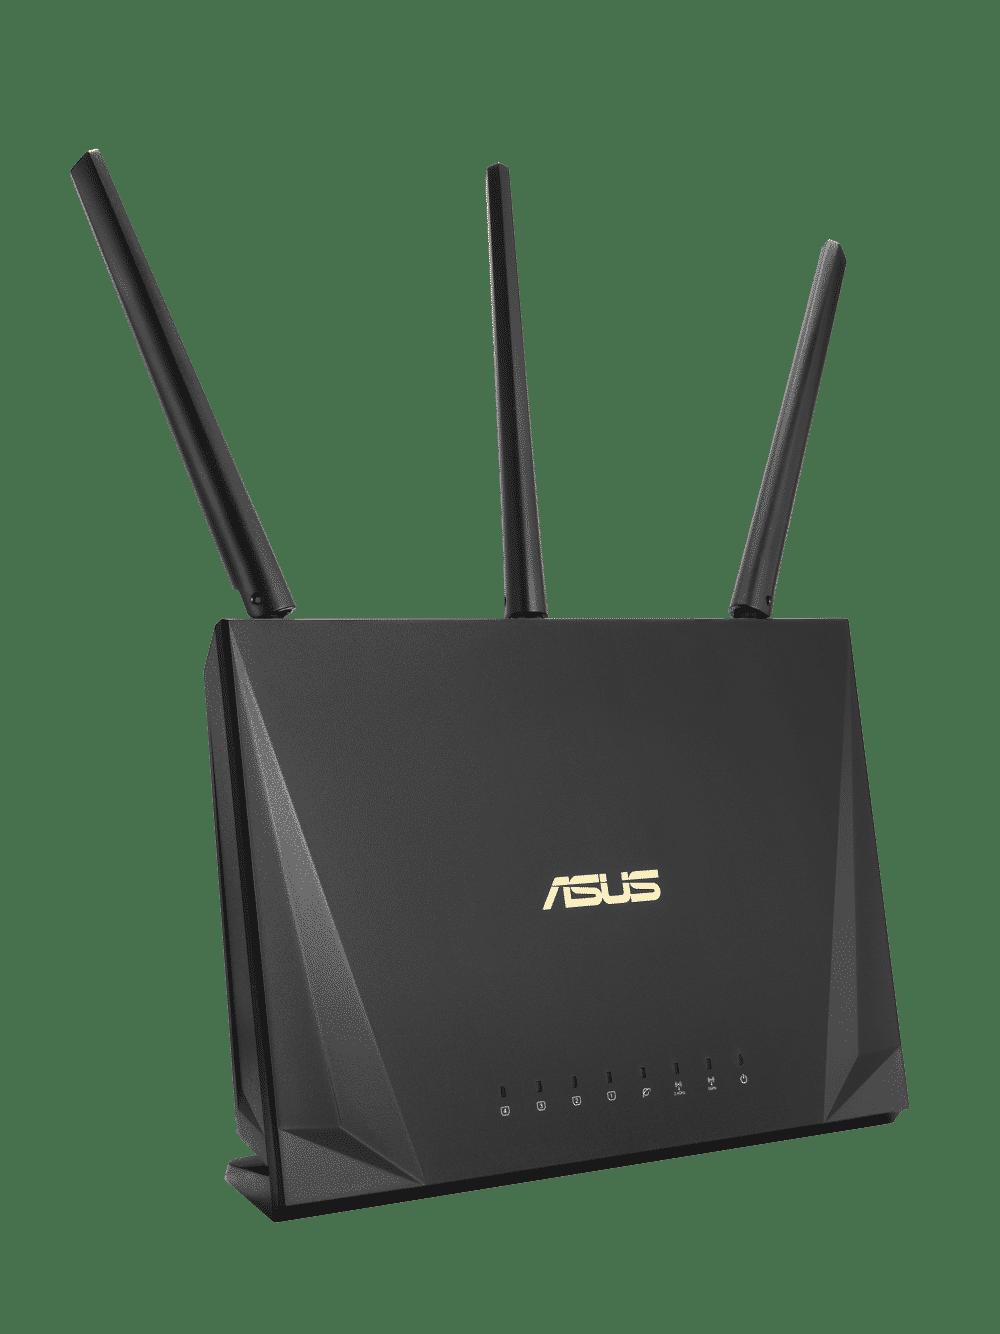 Testbericht: ASUS RT-AC85P 1